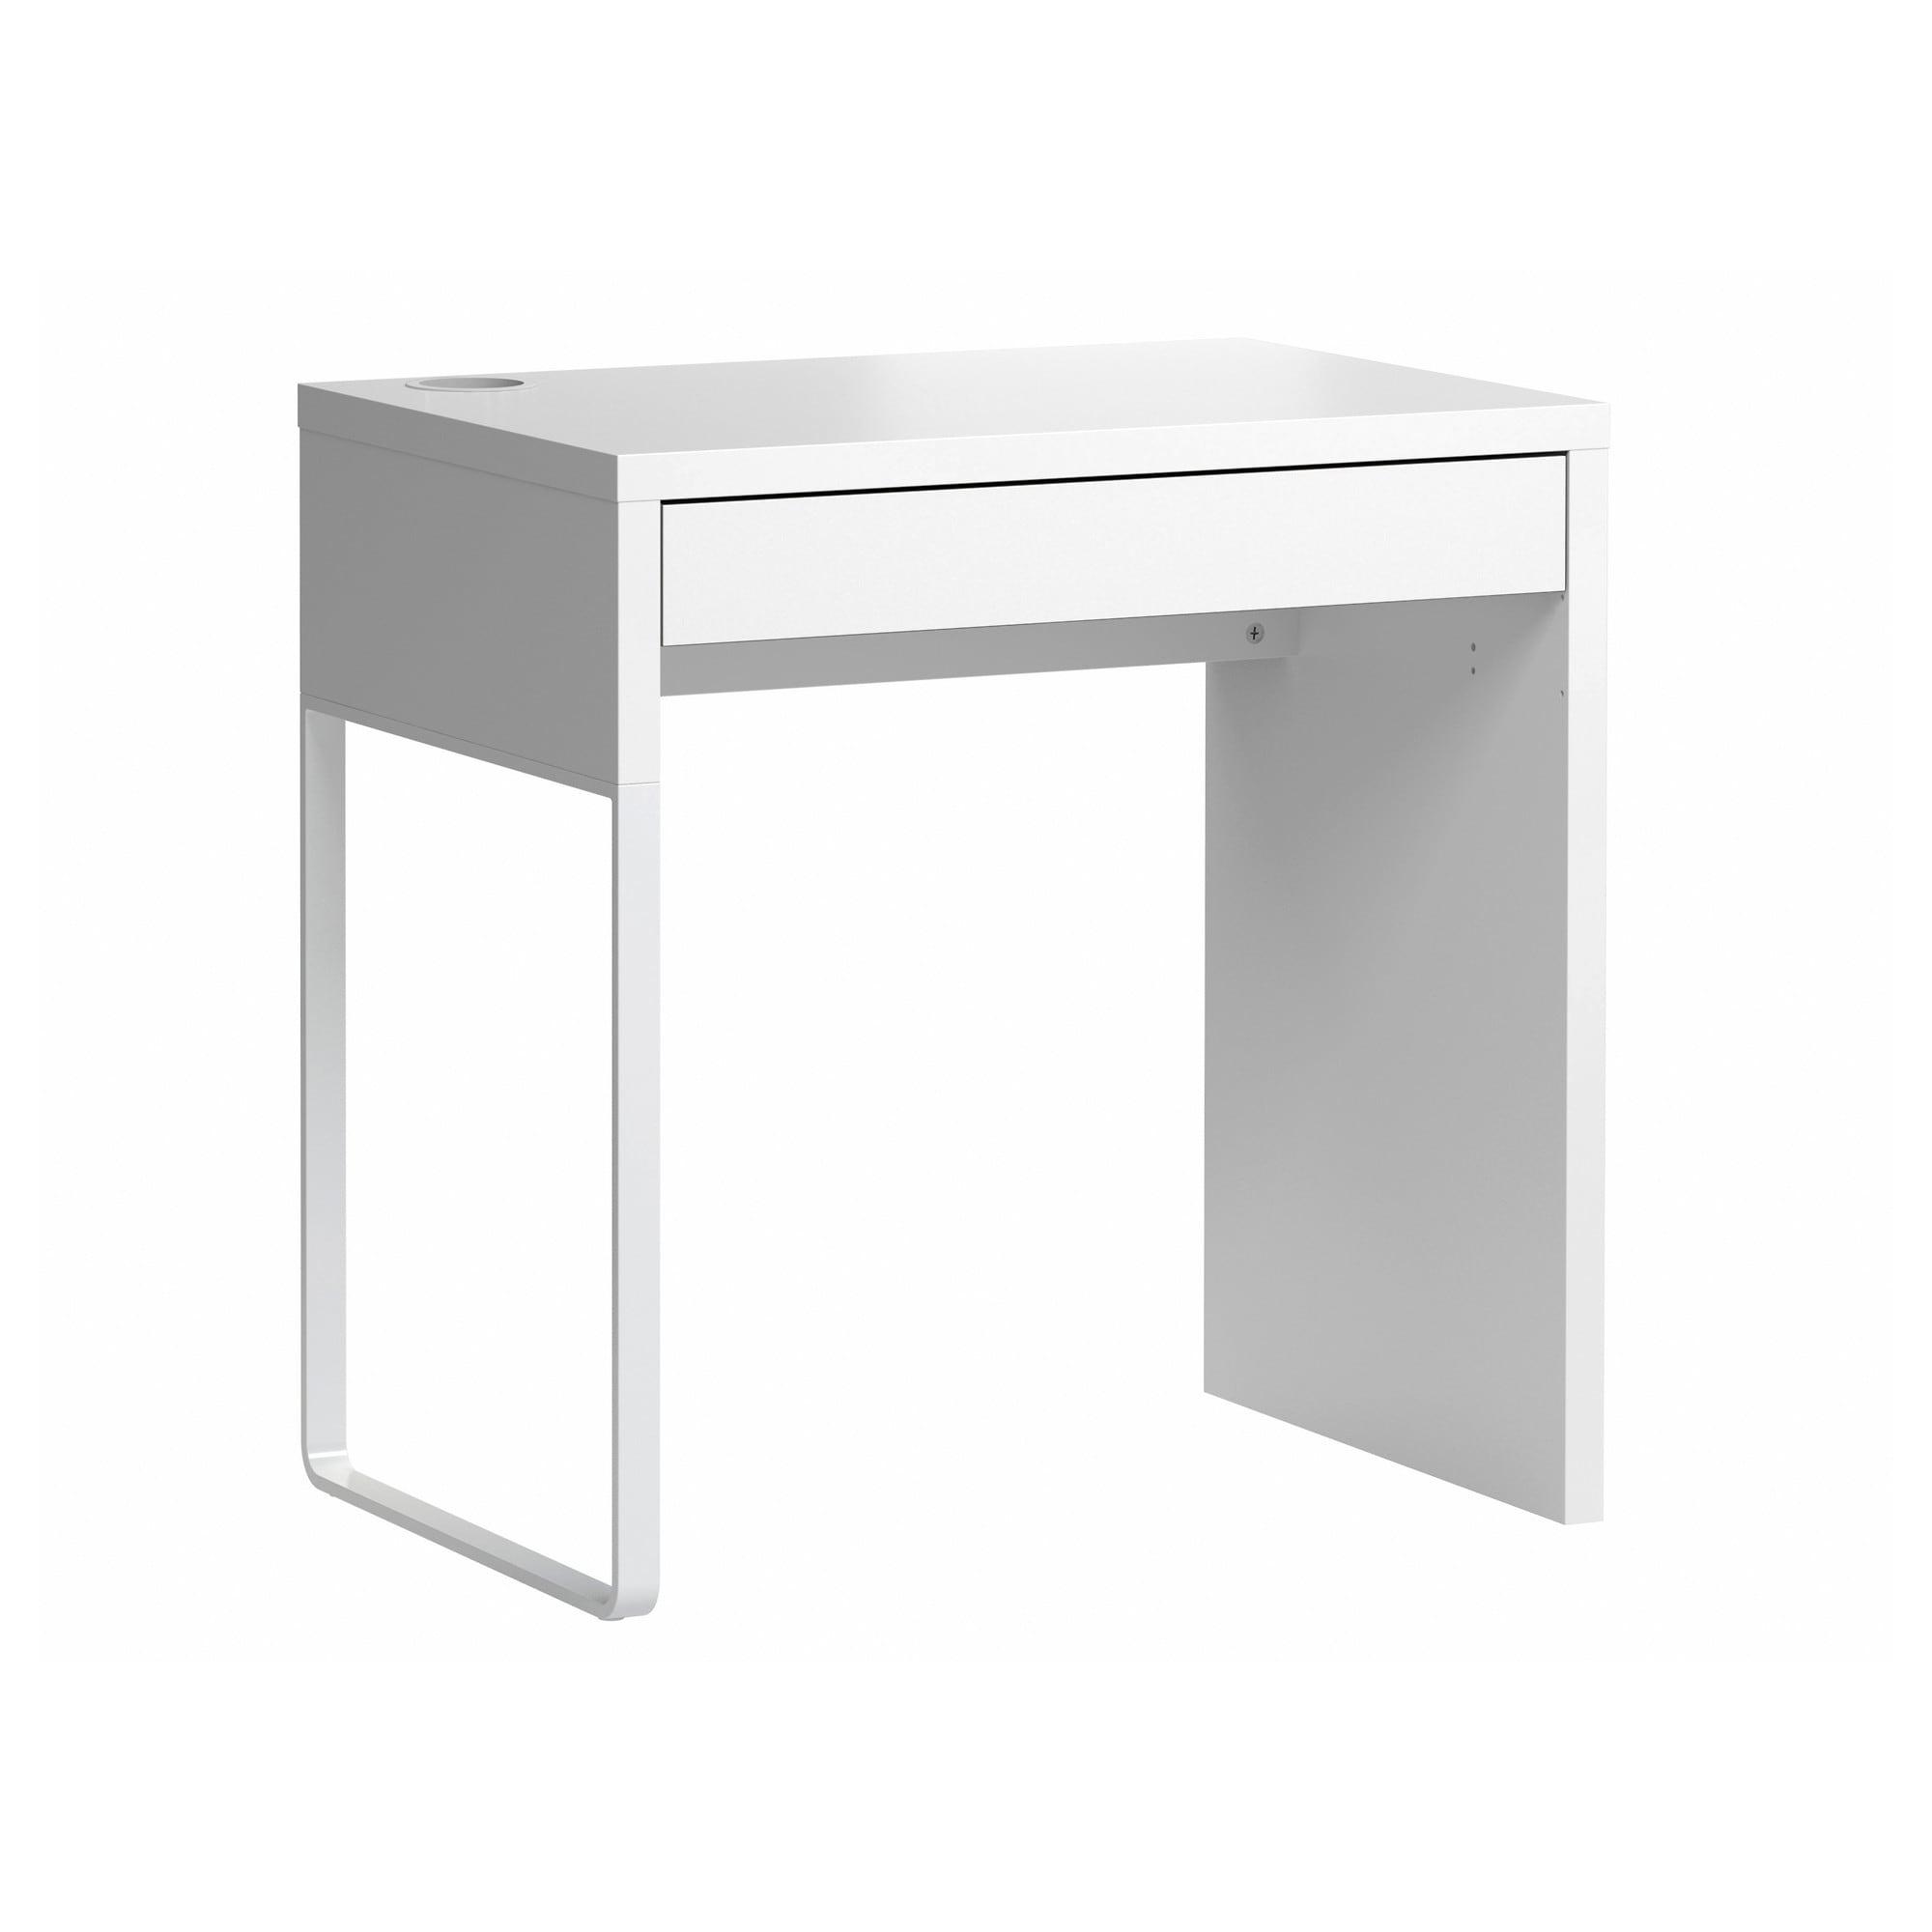 Ikea Mesas Estudio Drdp Micke Escritorio Blanco 73 X 50 Cm Ikea